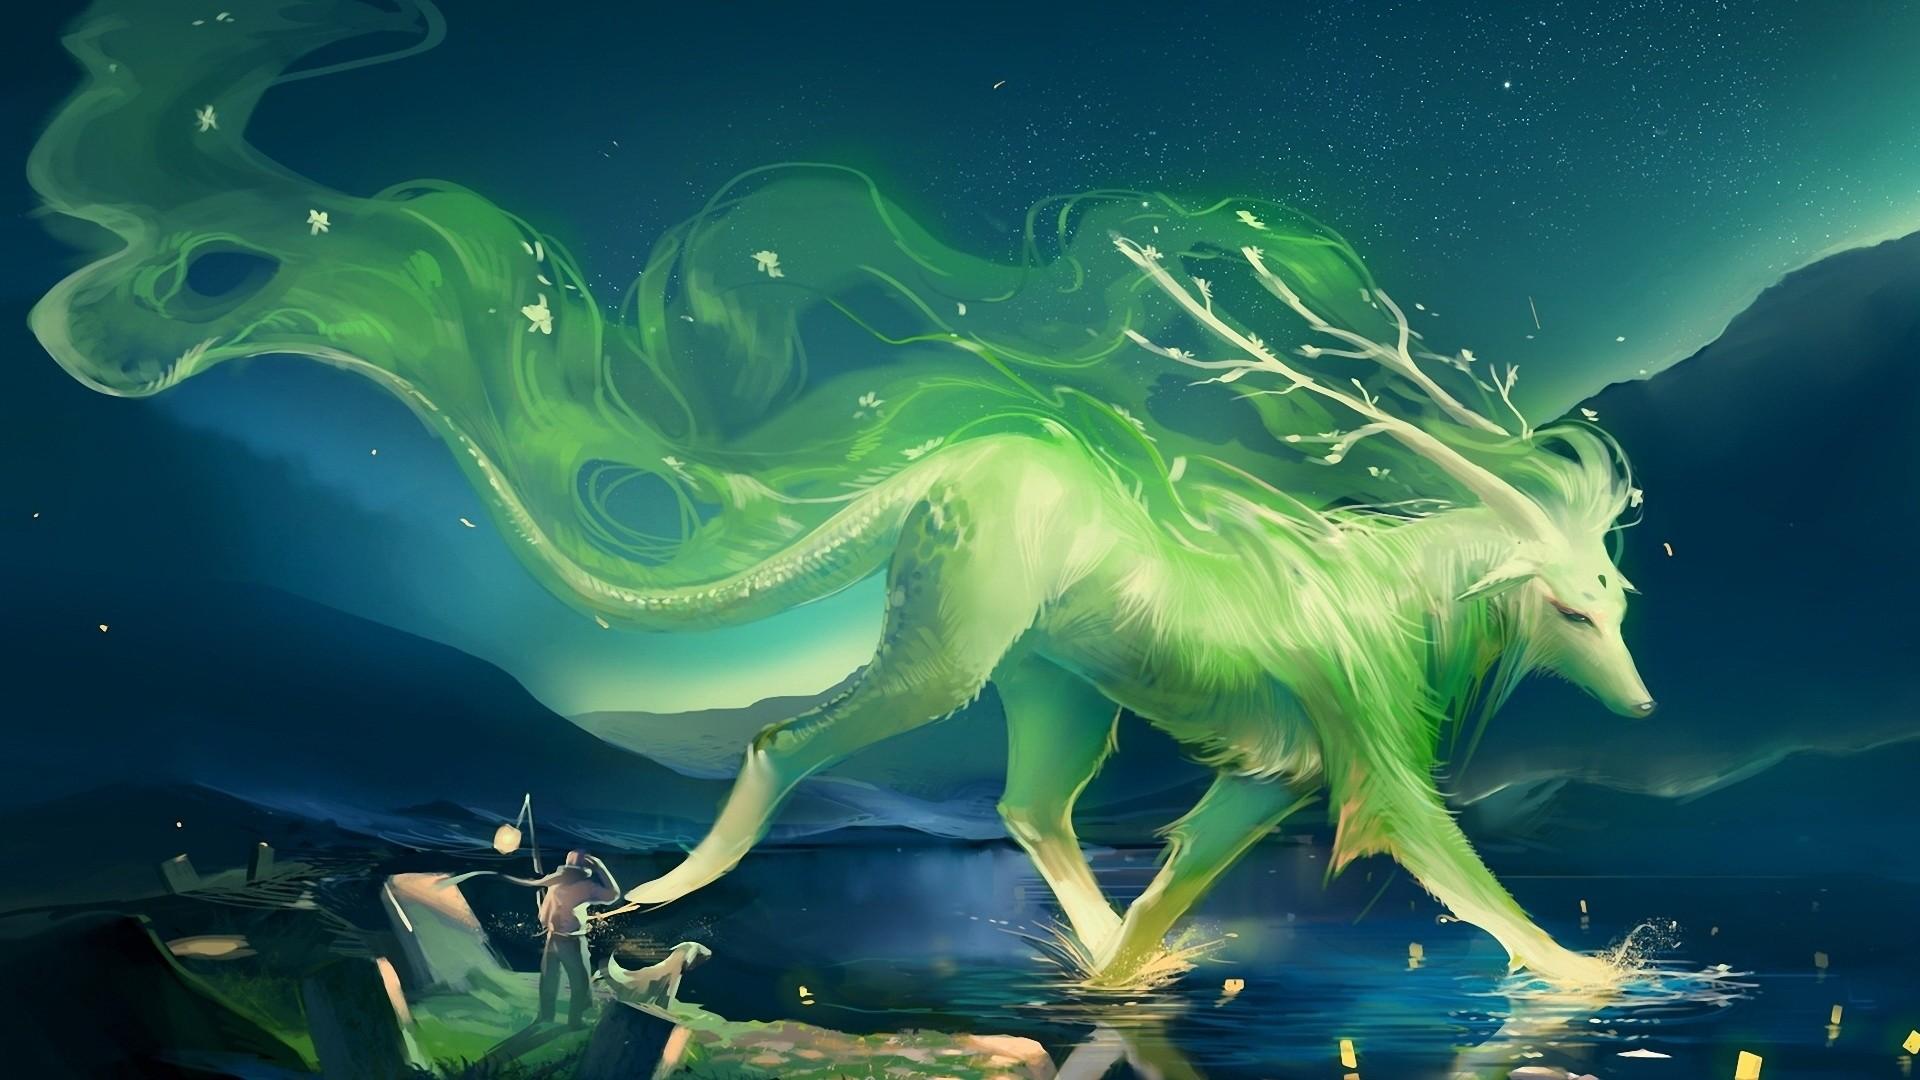 Res: 1920x1080, Green Deer Fantasy Wallpaper